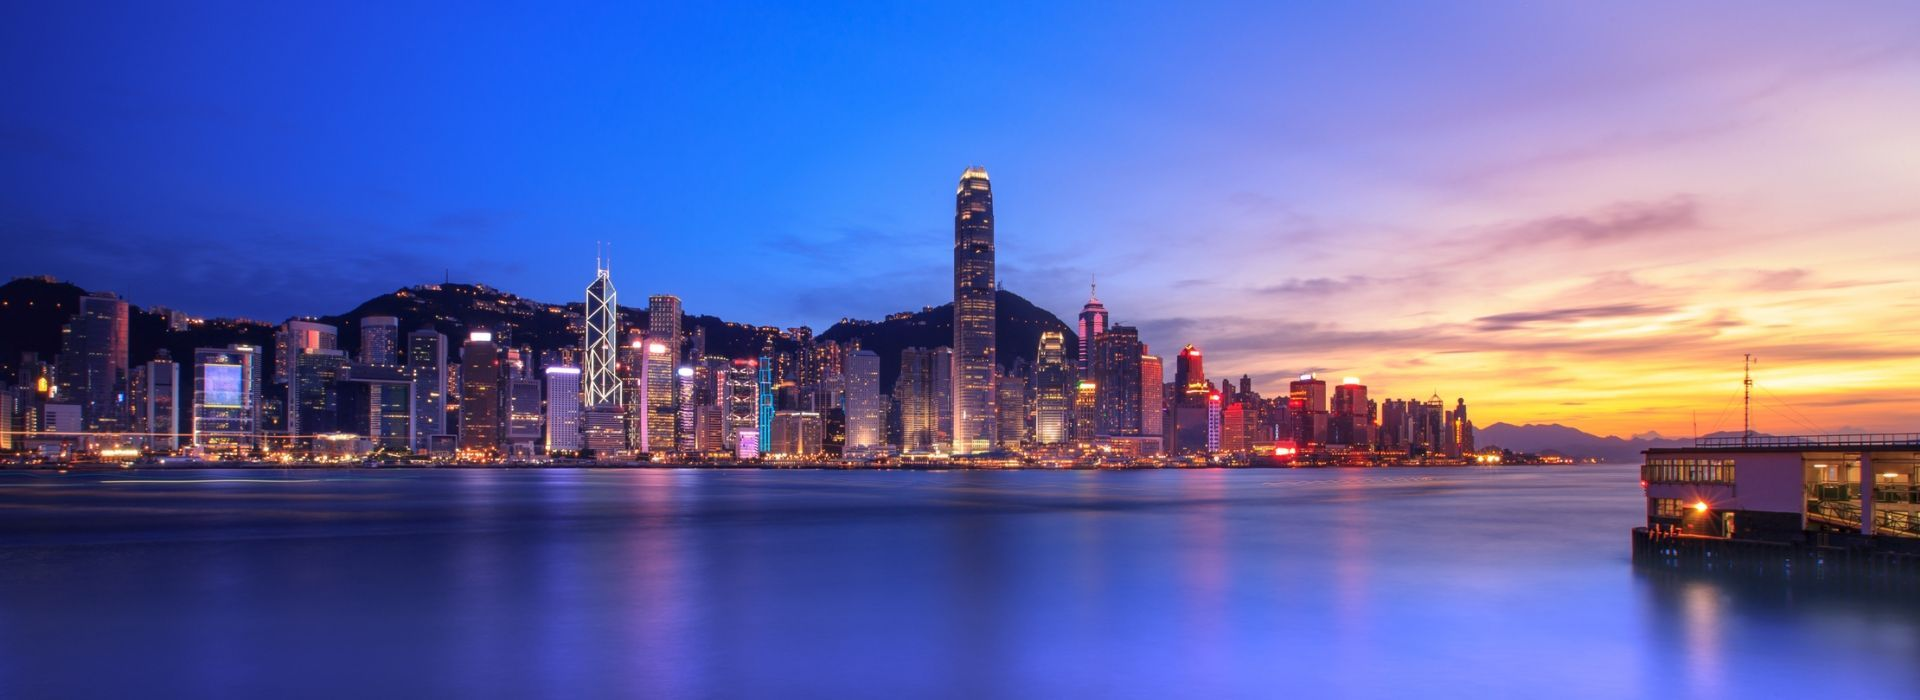 Hong Kong Tours and Trips to Hong Kong